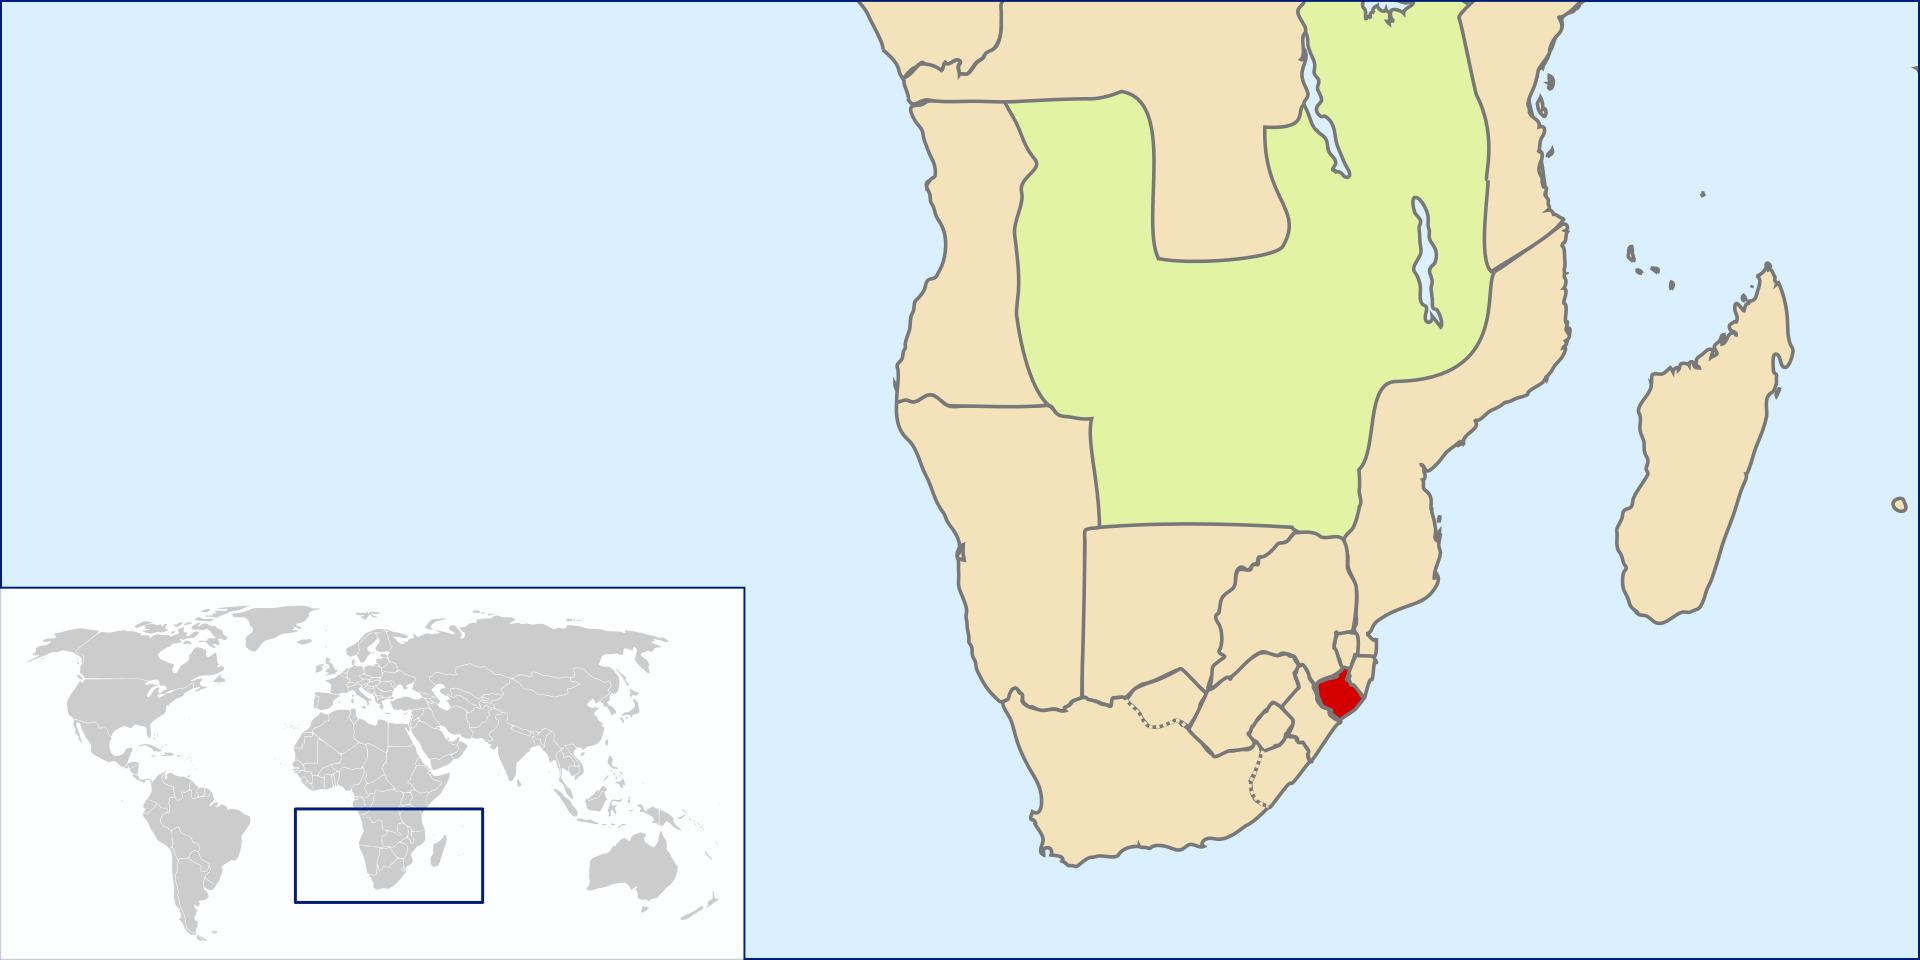 LocationZululandca1890.svg